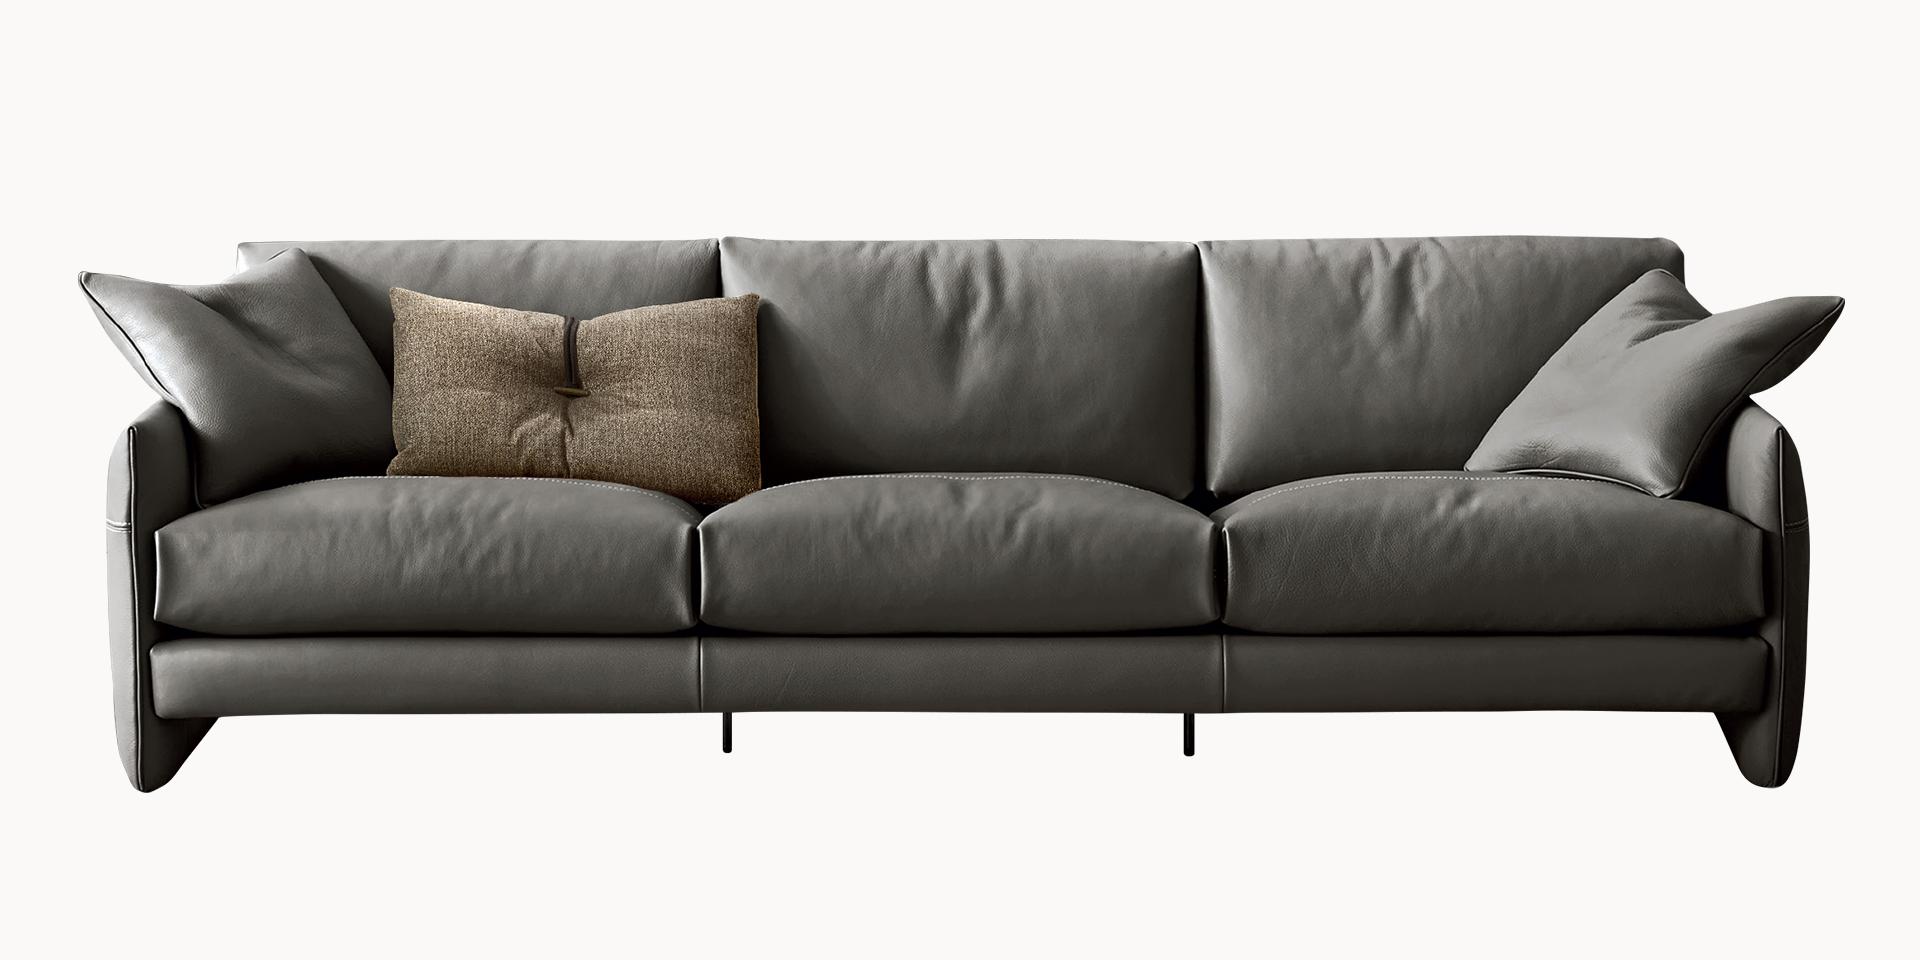 Fabulous Sofa Mood Gamma Arredamenti Andrewgaddart Wooden Chair Designs For Living Room Andrewgaddartcom